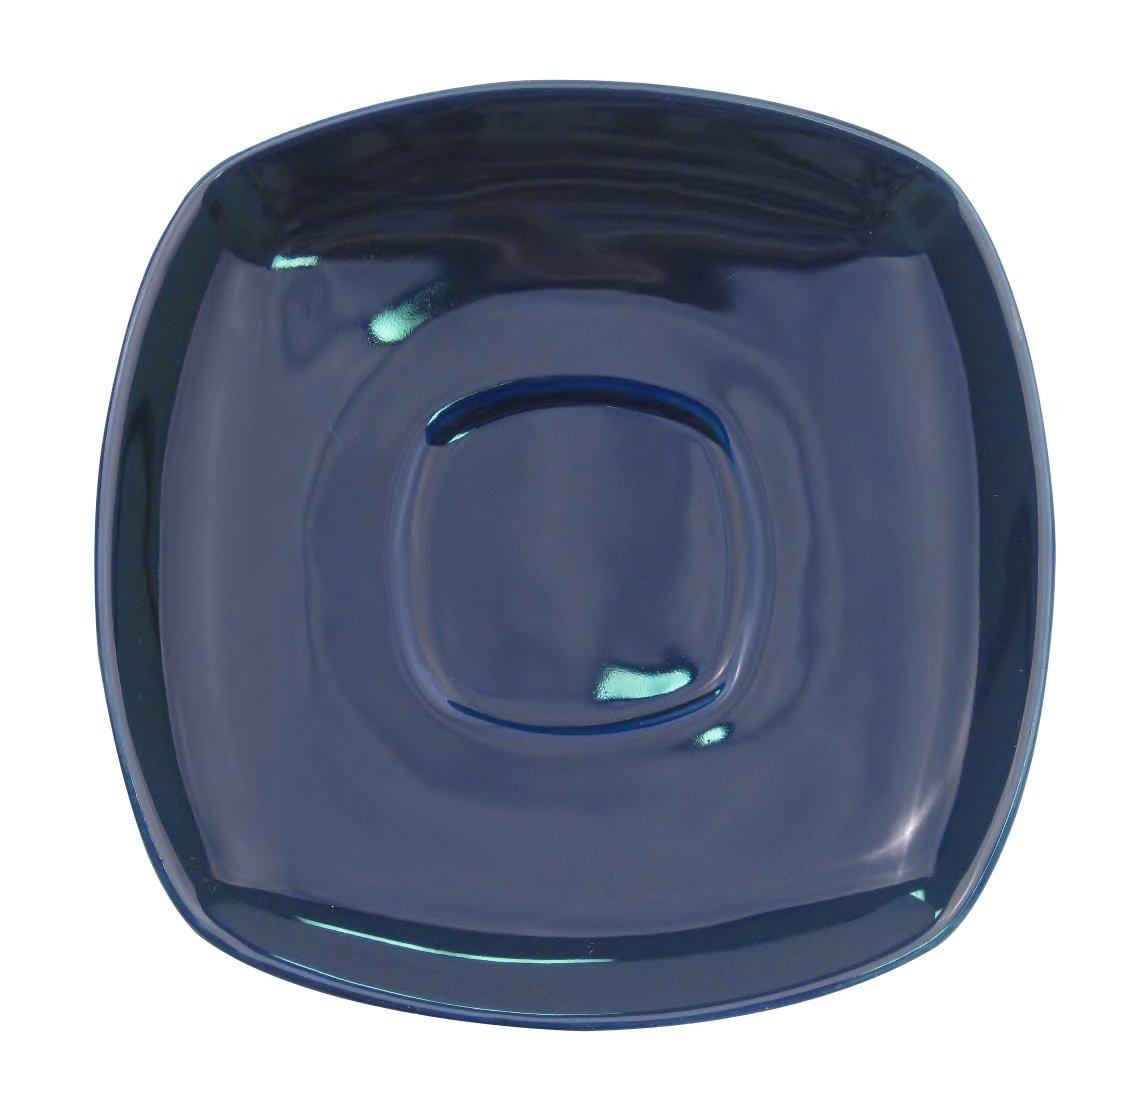 CAC China KC-2-CBU Color Arts 6-Inch Cobalt Blue Stoneware Square Saucer, Box of 36